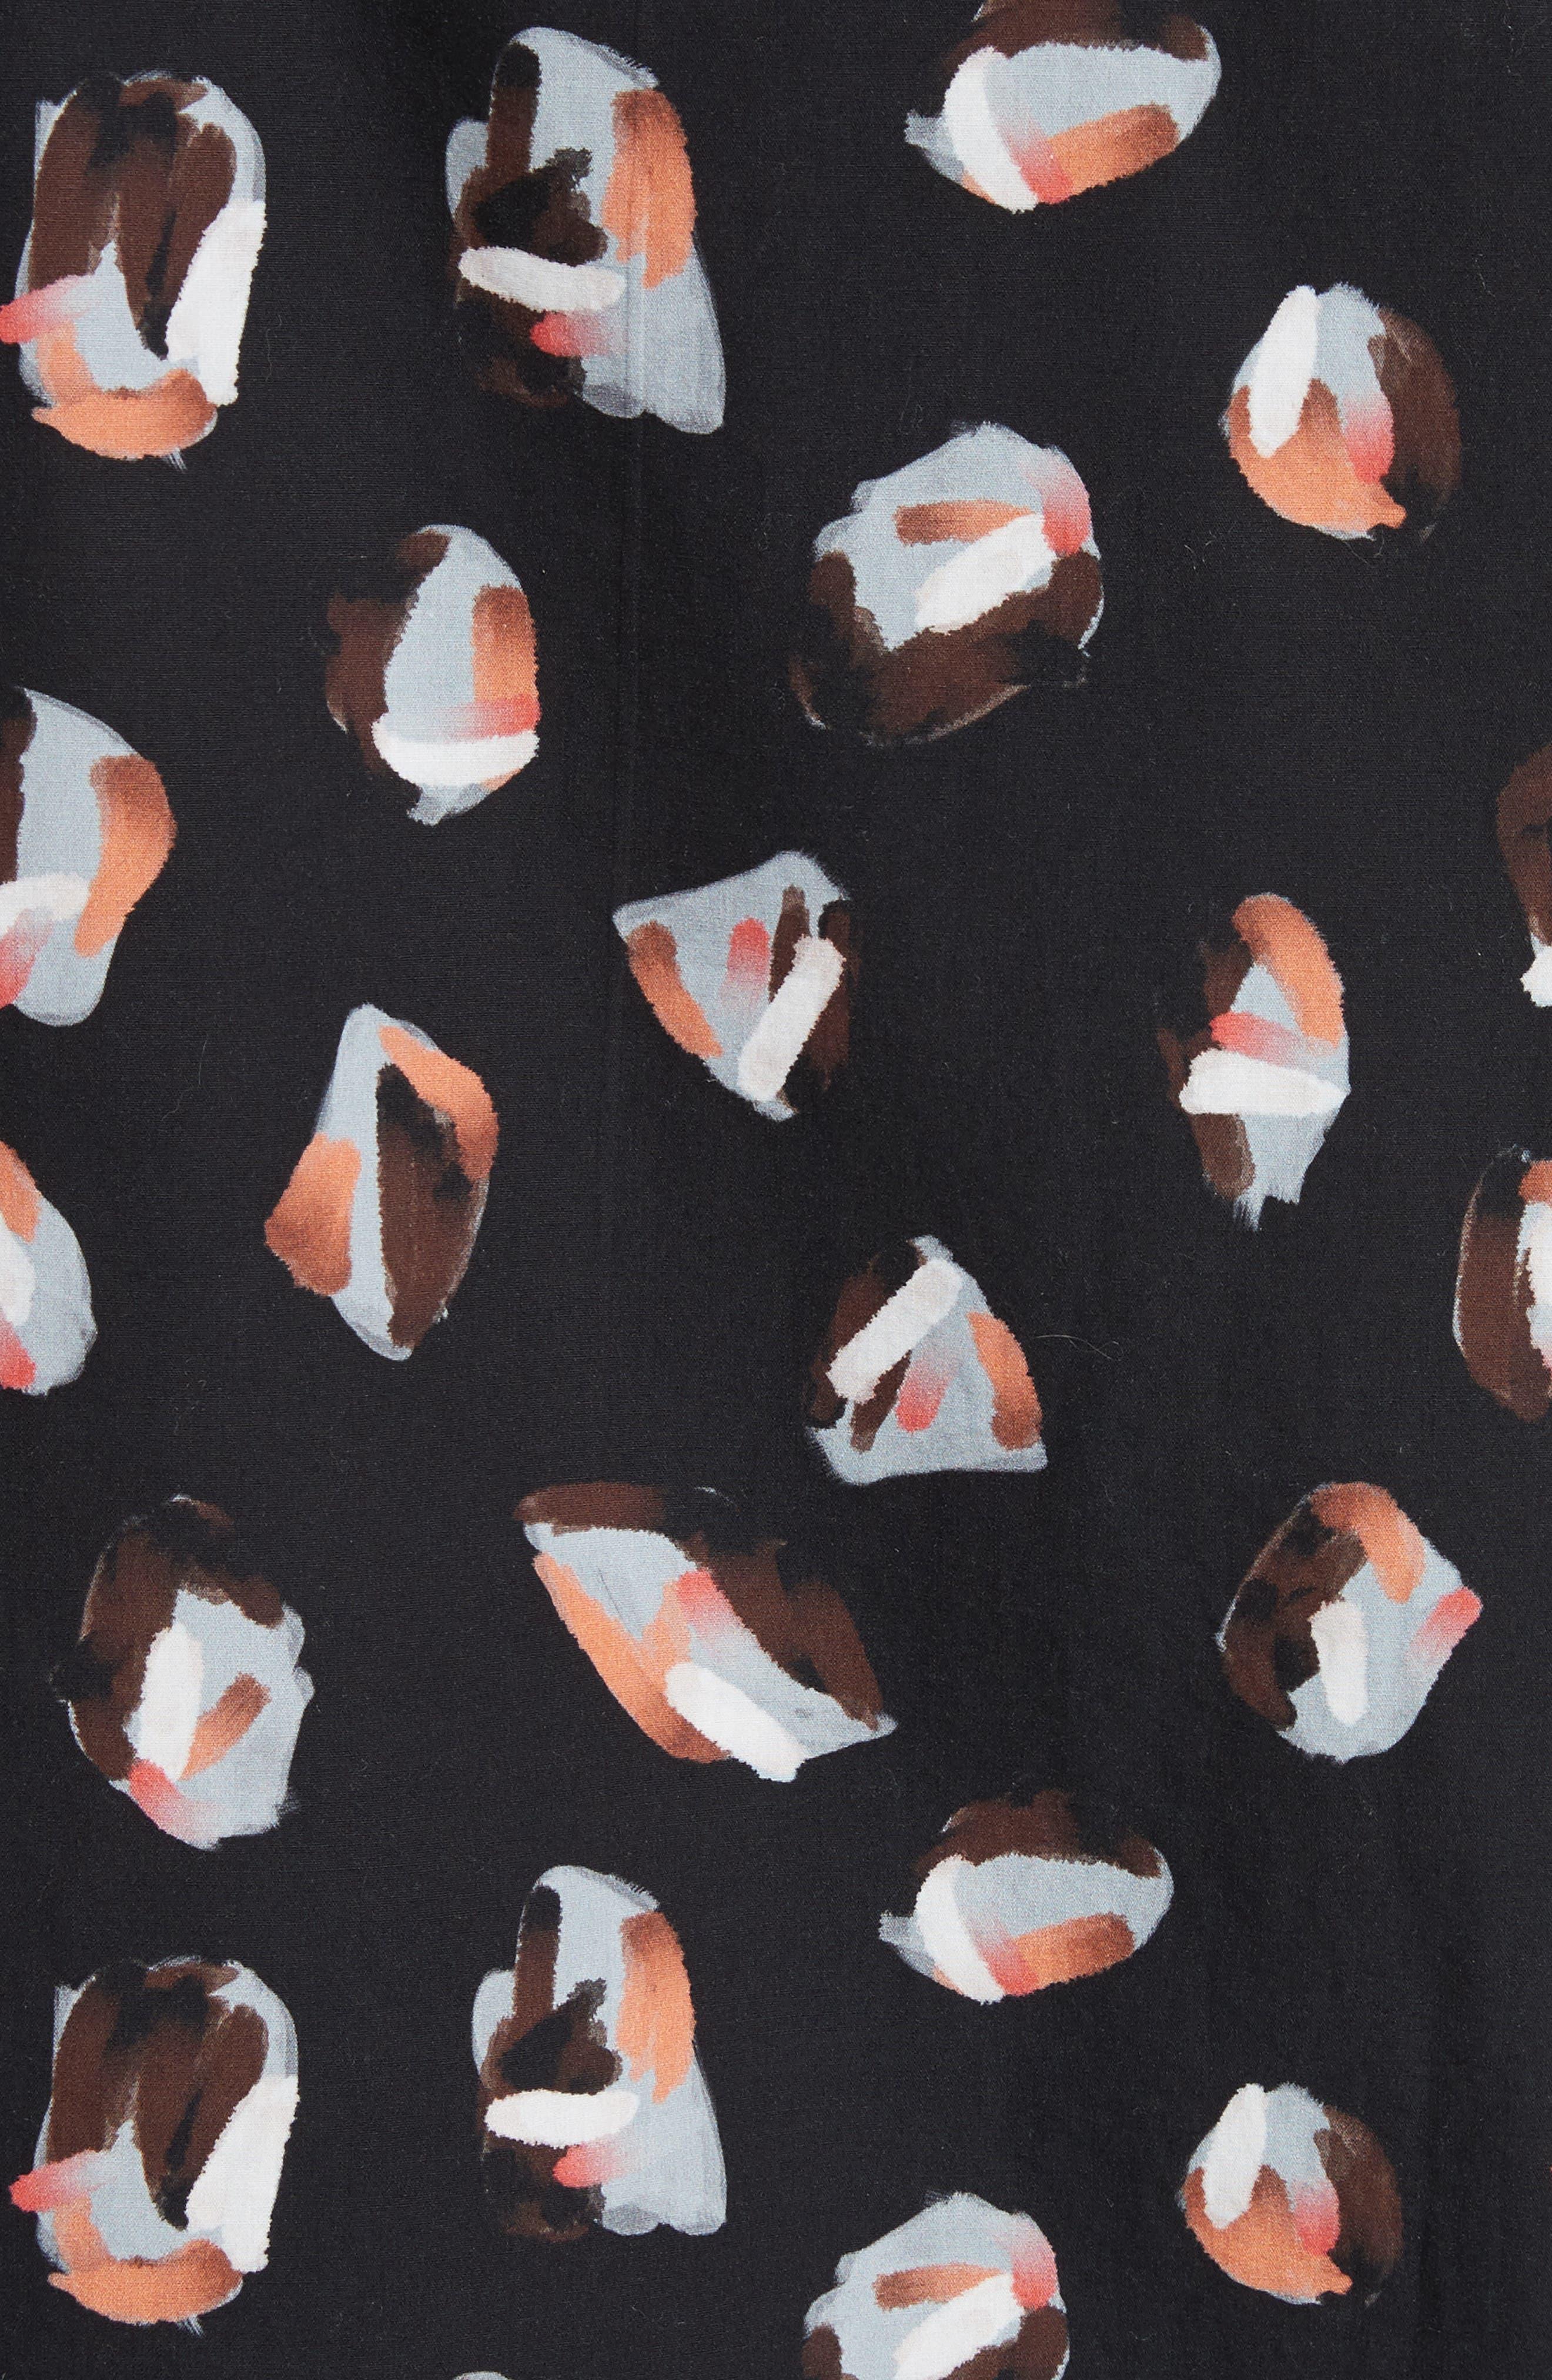 Crosby Spots Woven Shirt,                             Alternate thumbnail 9, color,